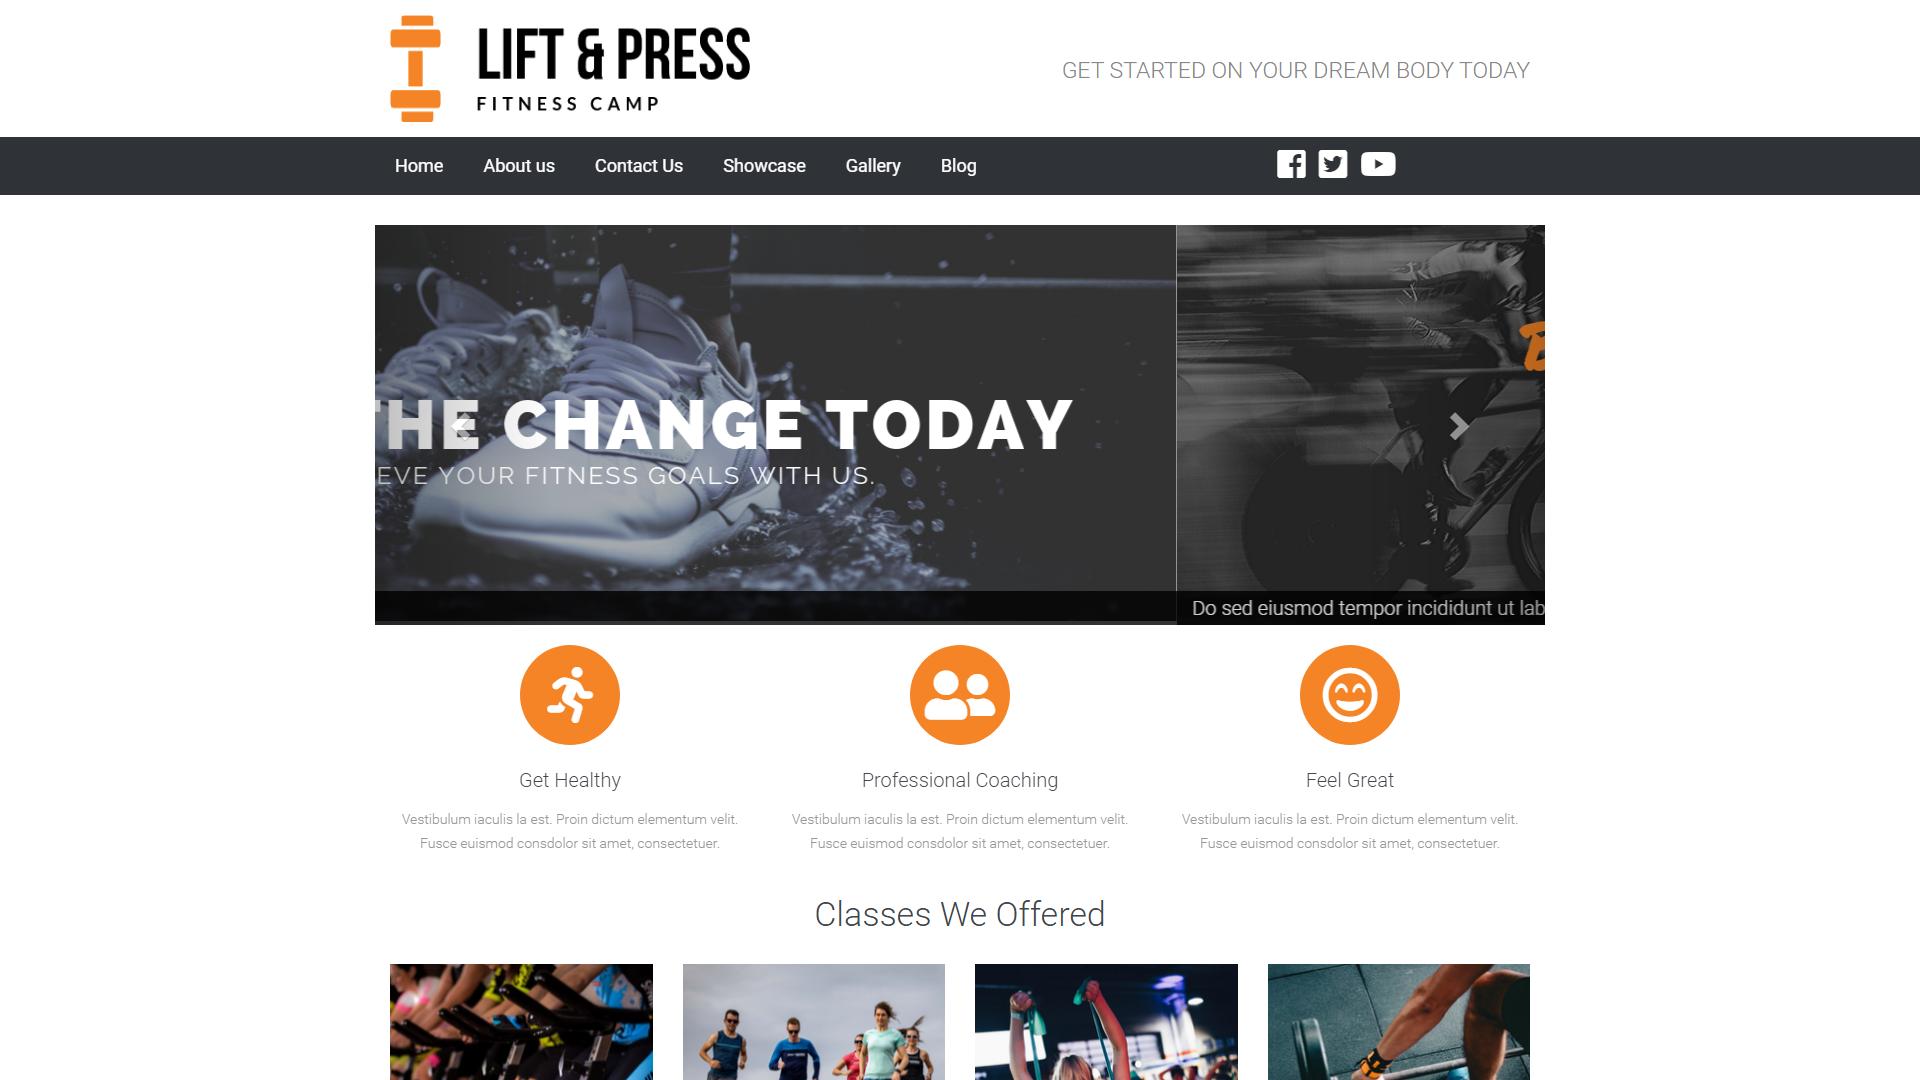 Lift & Press, eSolve Showcase Website Template